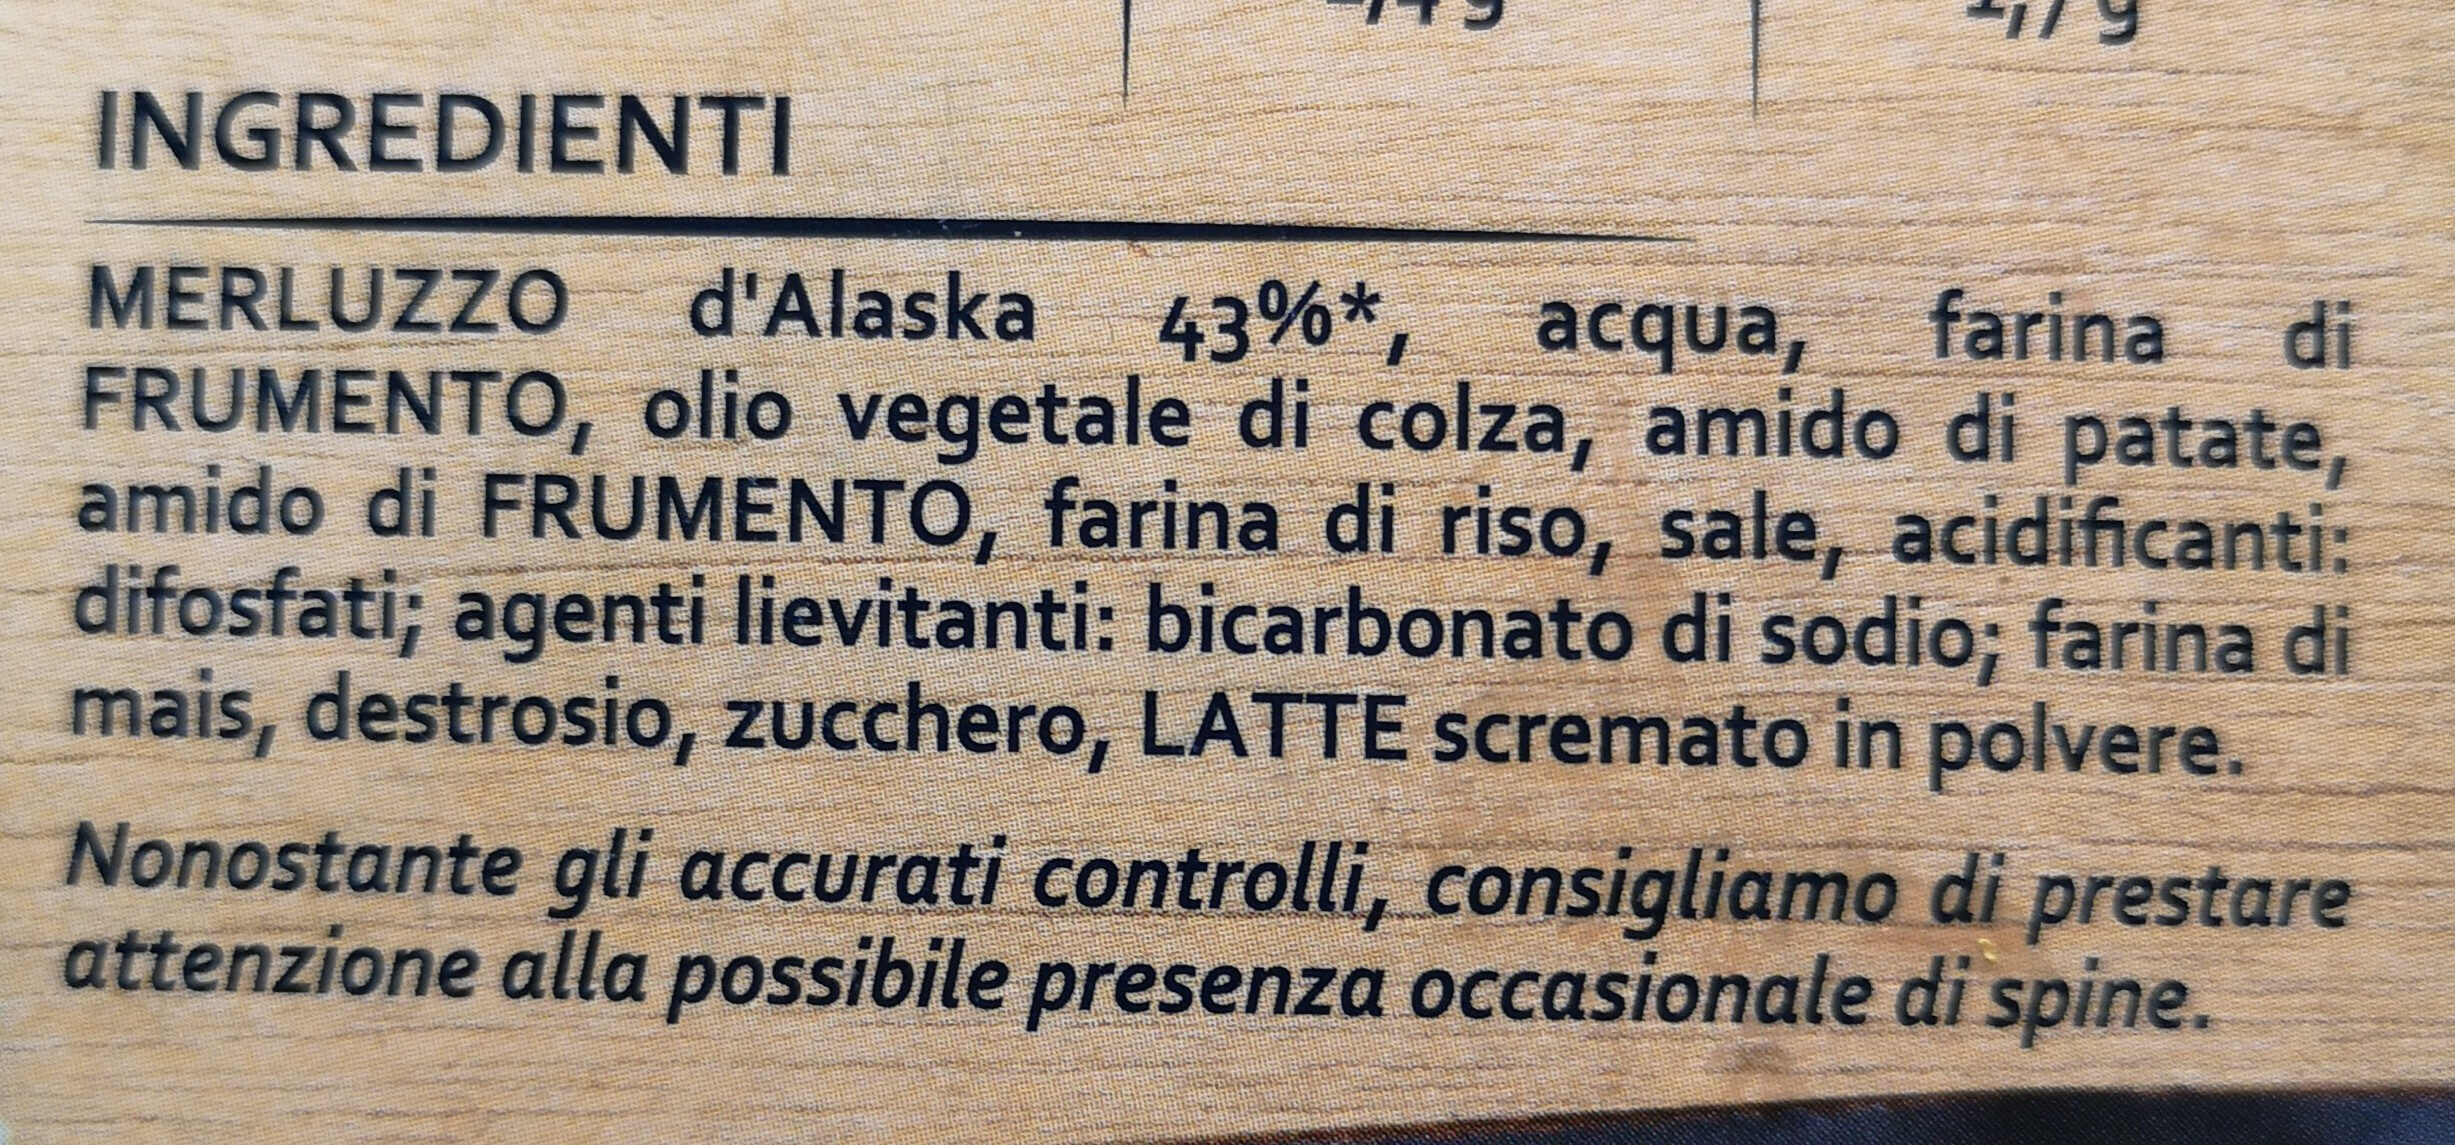 Nuggets di MERLUZZO di Alaska - Ingrédients - it